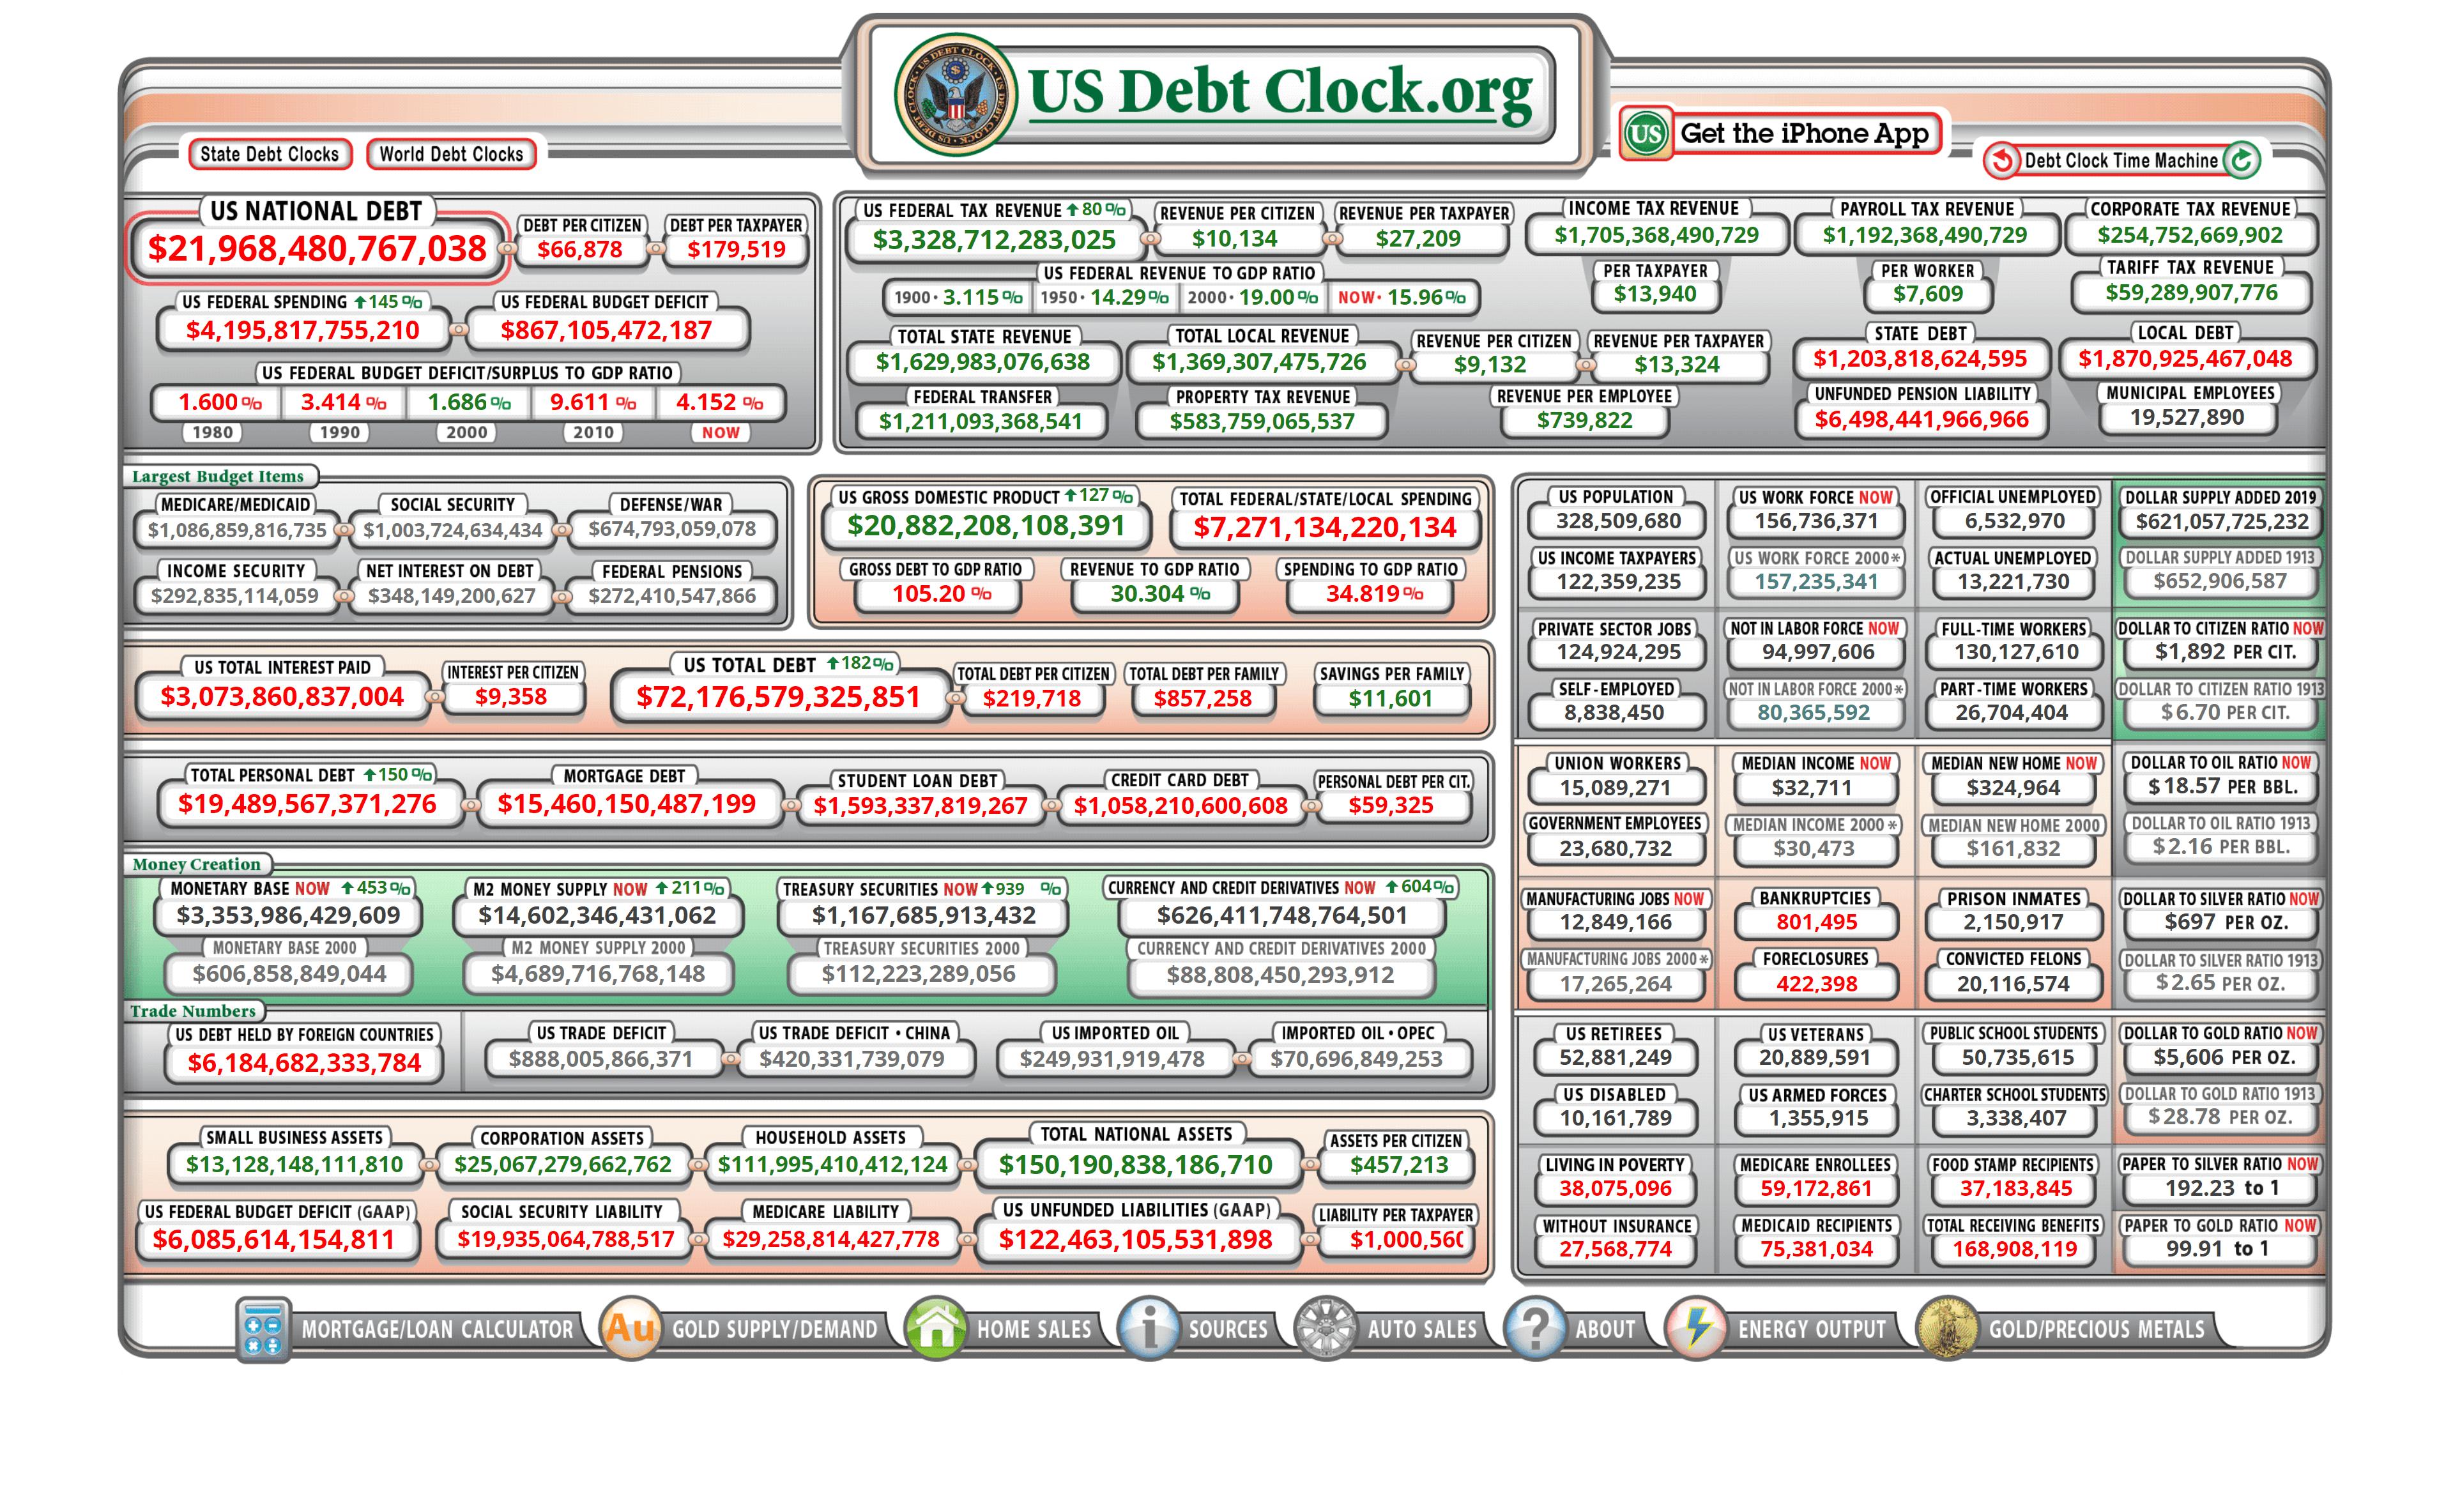 U.S.-National-Debt-Clock-_-Real-Time-http___www.usdebtclock.org